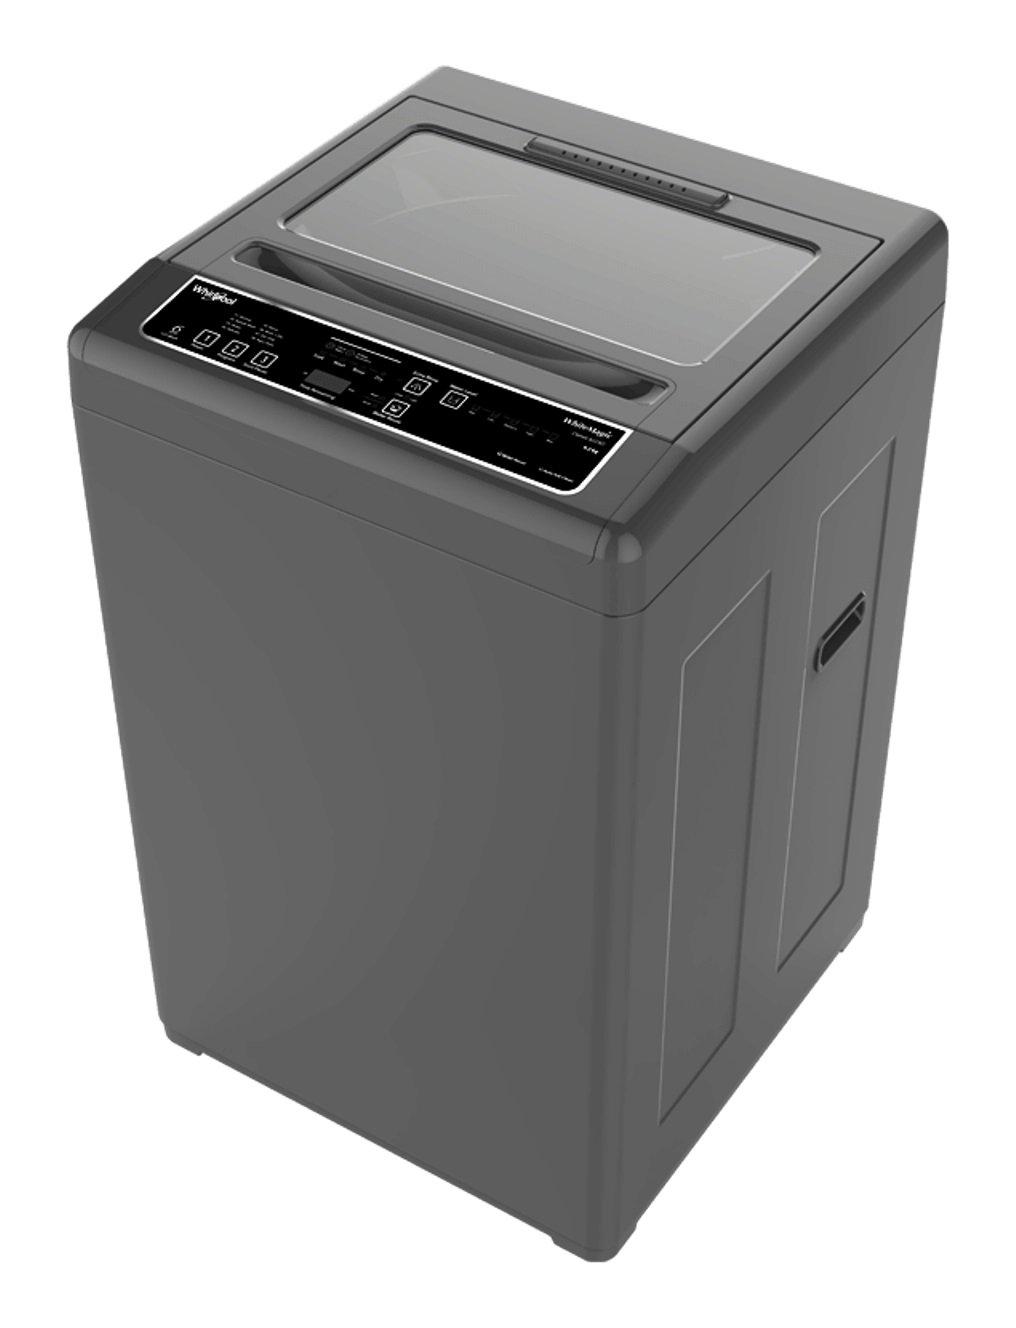 Whirlpool 6.5 Kg Fully Automatic Washing Machine WHITEMAGIC CLASSIC 652 SDX Image